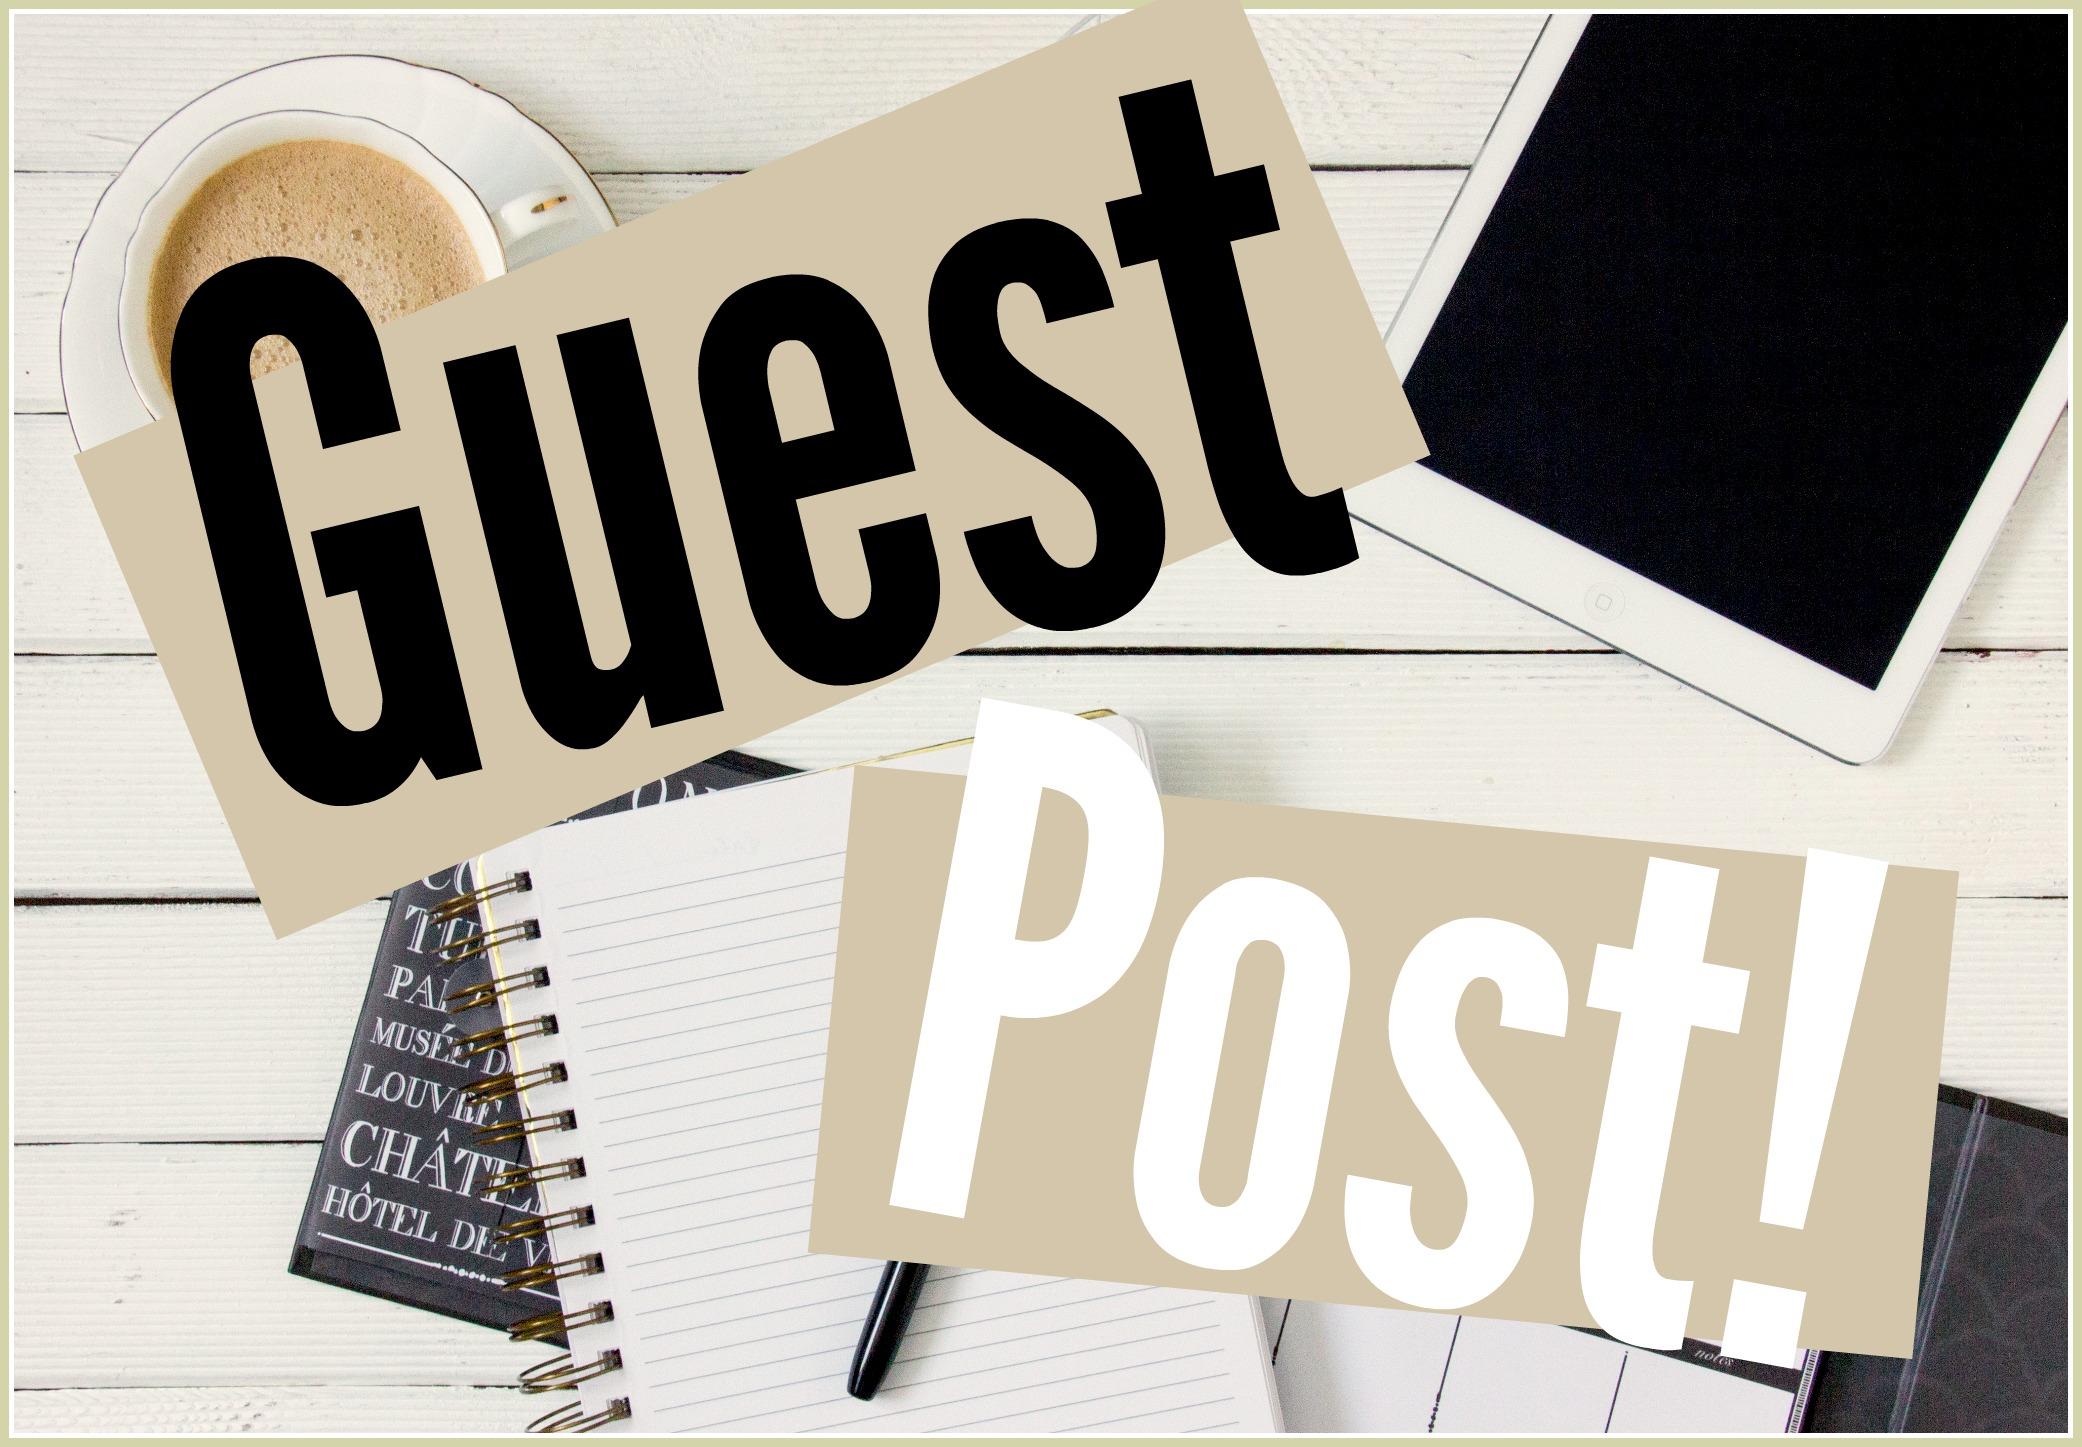 05 Guest Post with 500+ words content 100 unique